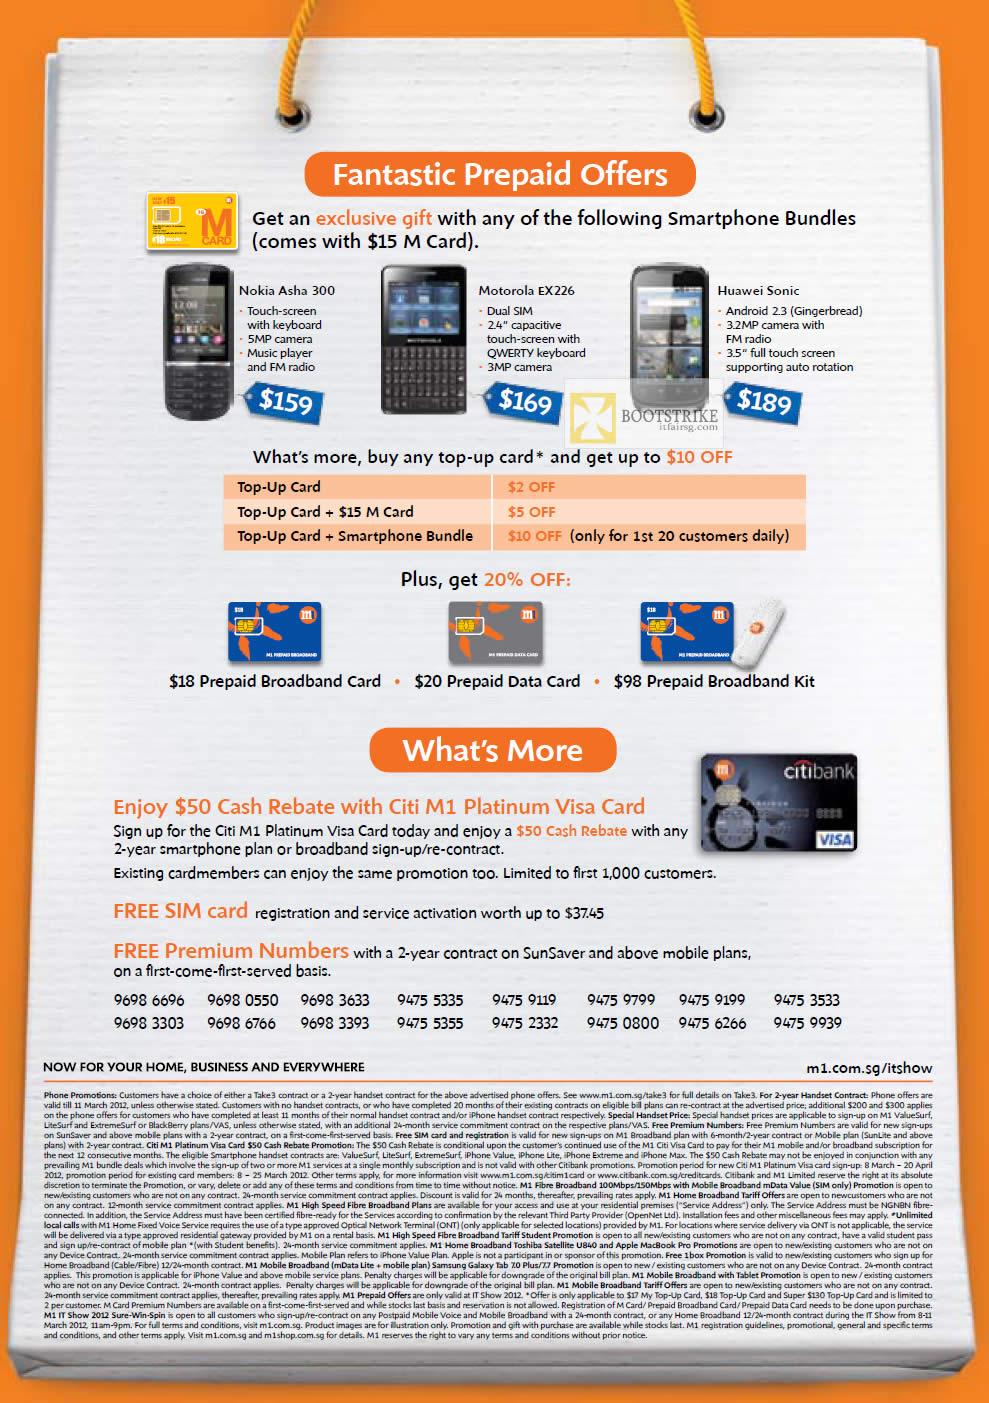 IT SHOW 2012 price list image brochure of M1 Mobile Nokia Asha 300, Motorola EX226, Huawei Sonic, Prepaid Broadband, Data Card, Citibank